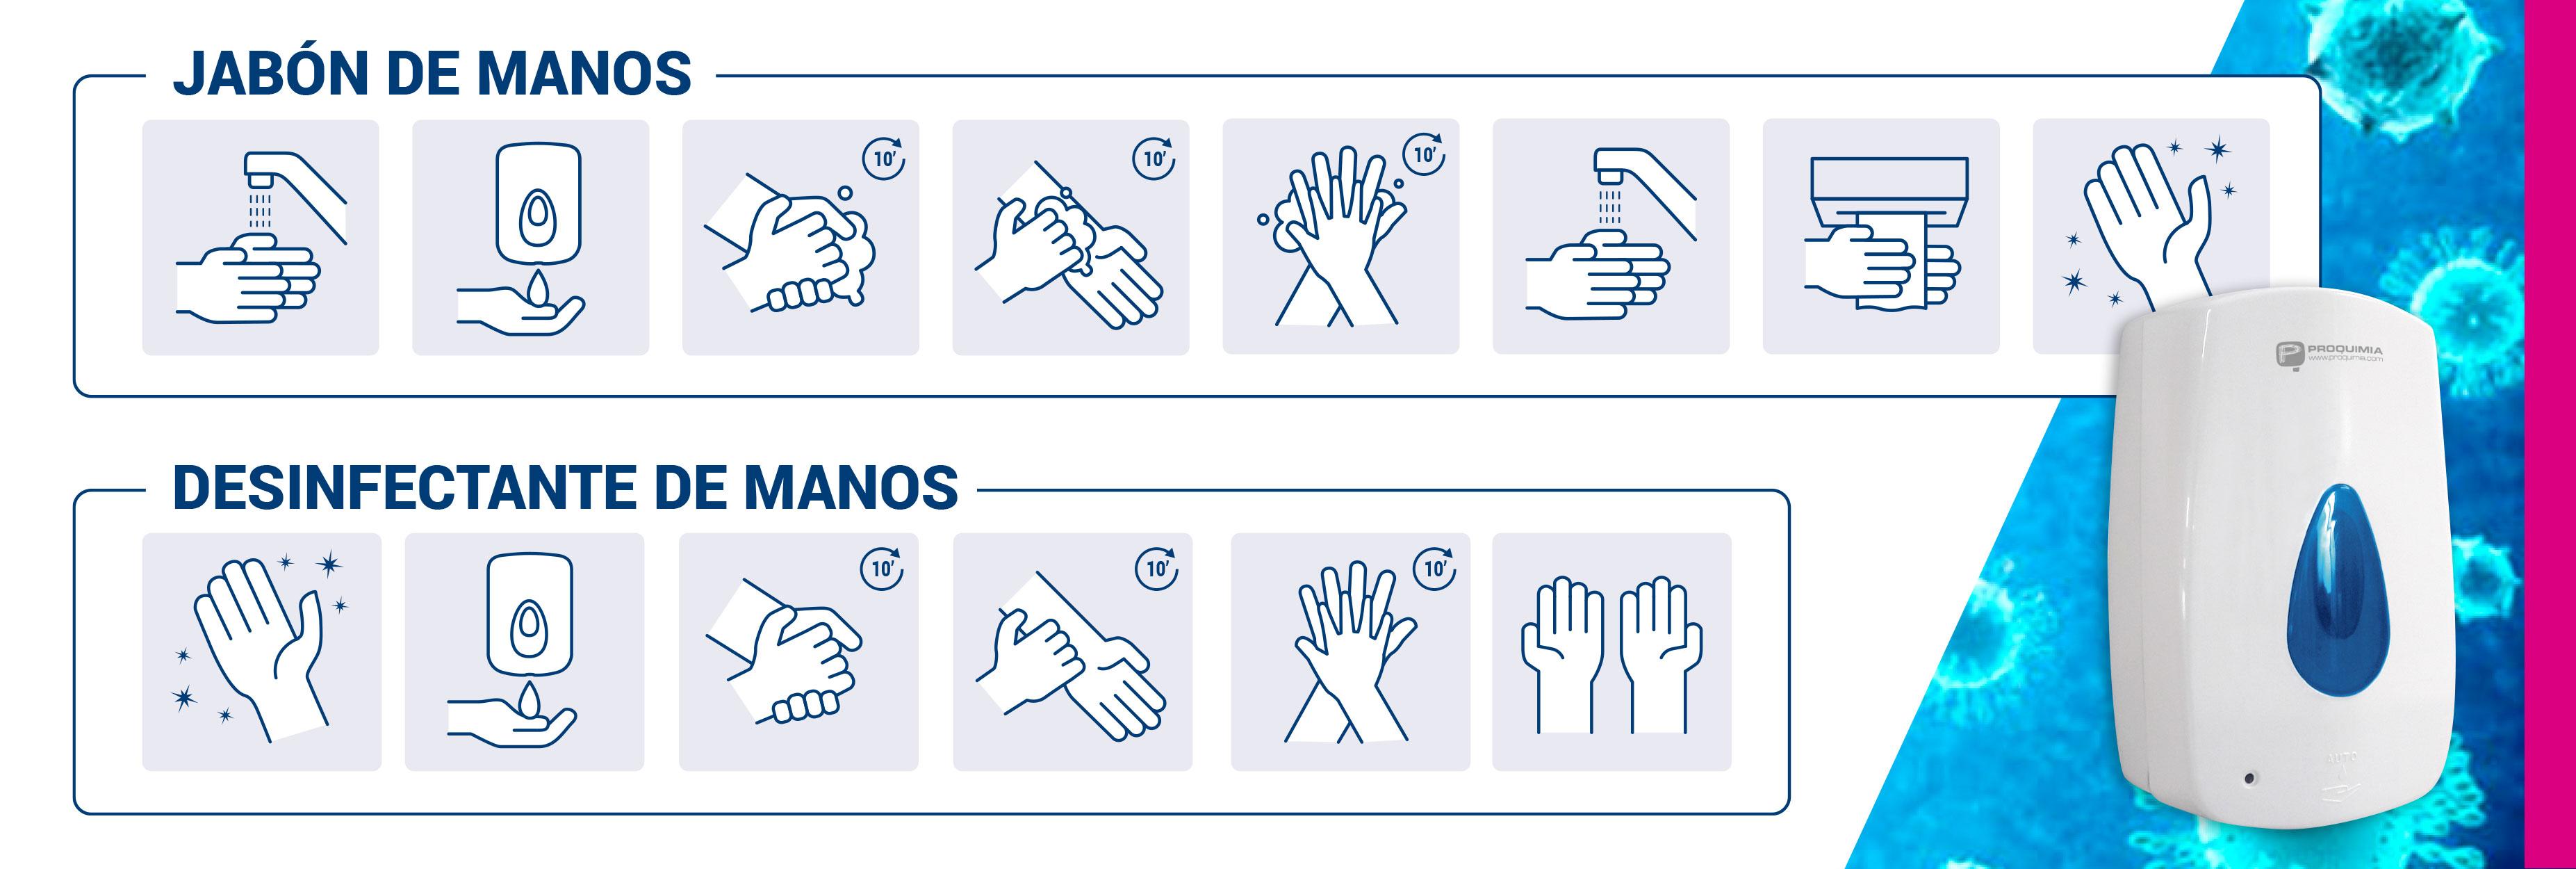 medidas higiene coronavirus en industrias agroalimentarias